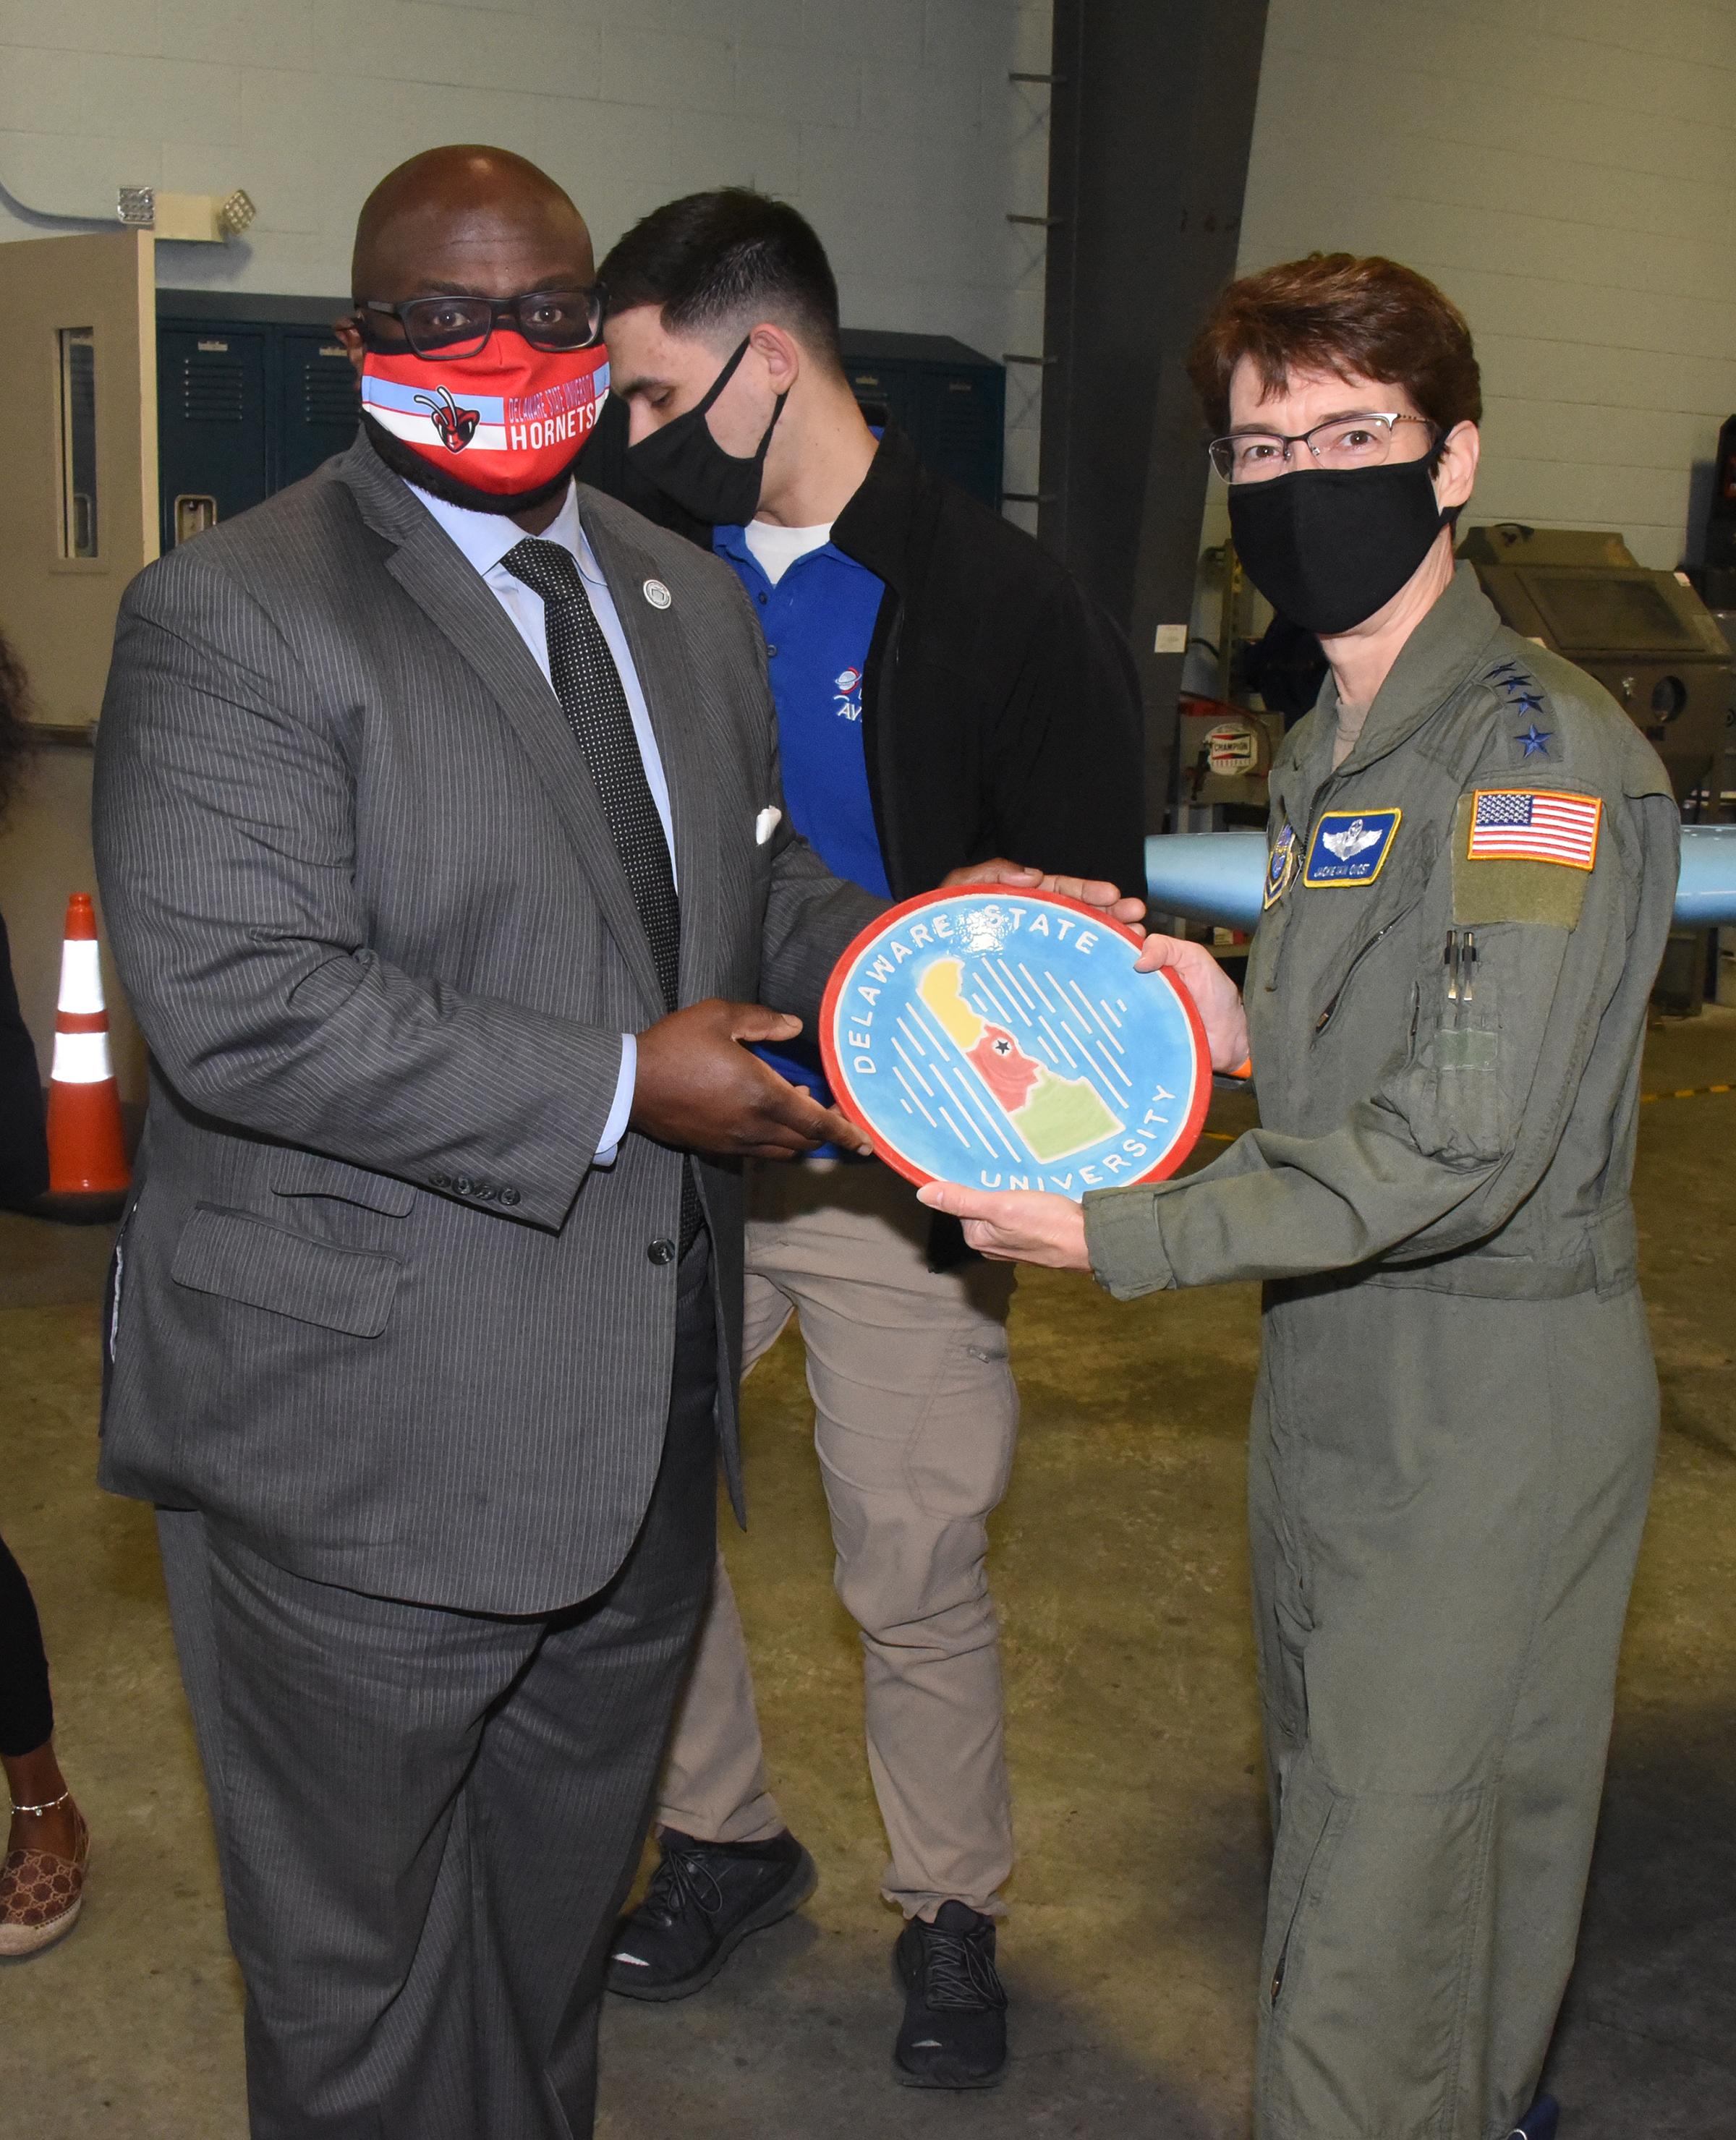 University President Tony Allen presents Gen. Van Ovost with a Del State plate.